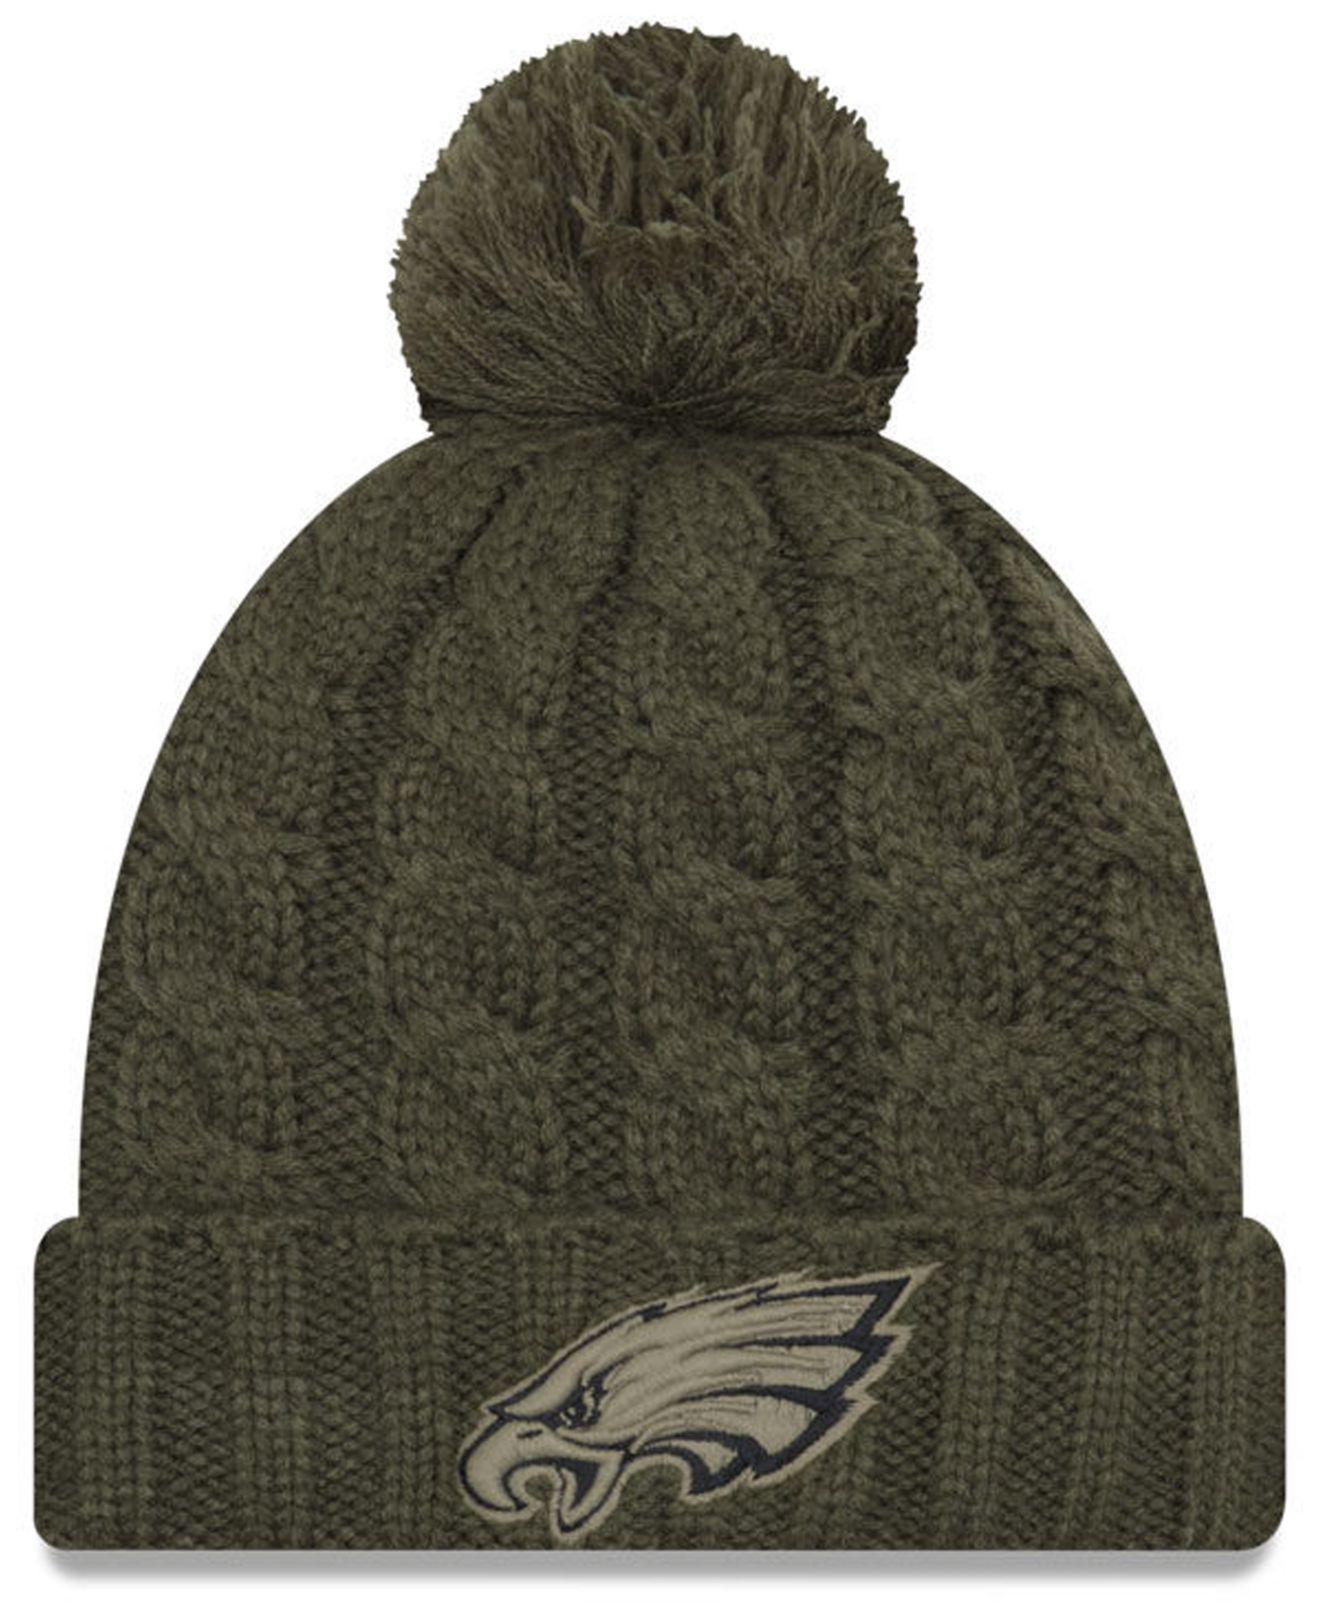 9910b401a06 Lyst - Ktz Philadelphia Eagles Salute To Service Pom Knit Hat in Green